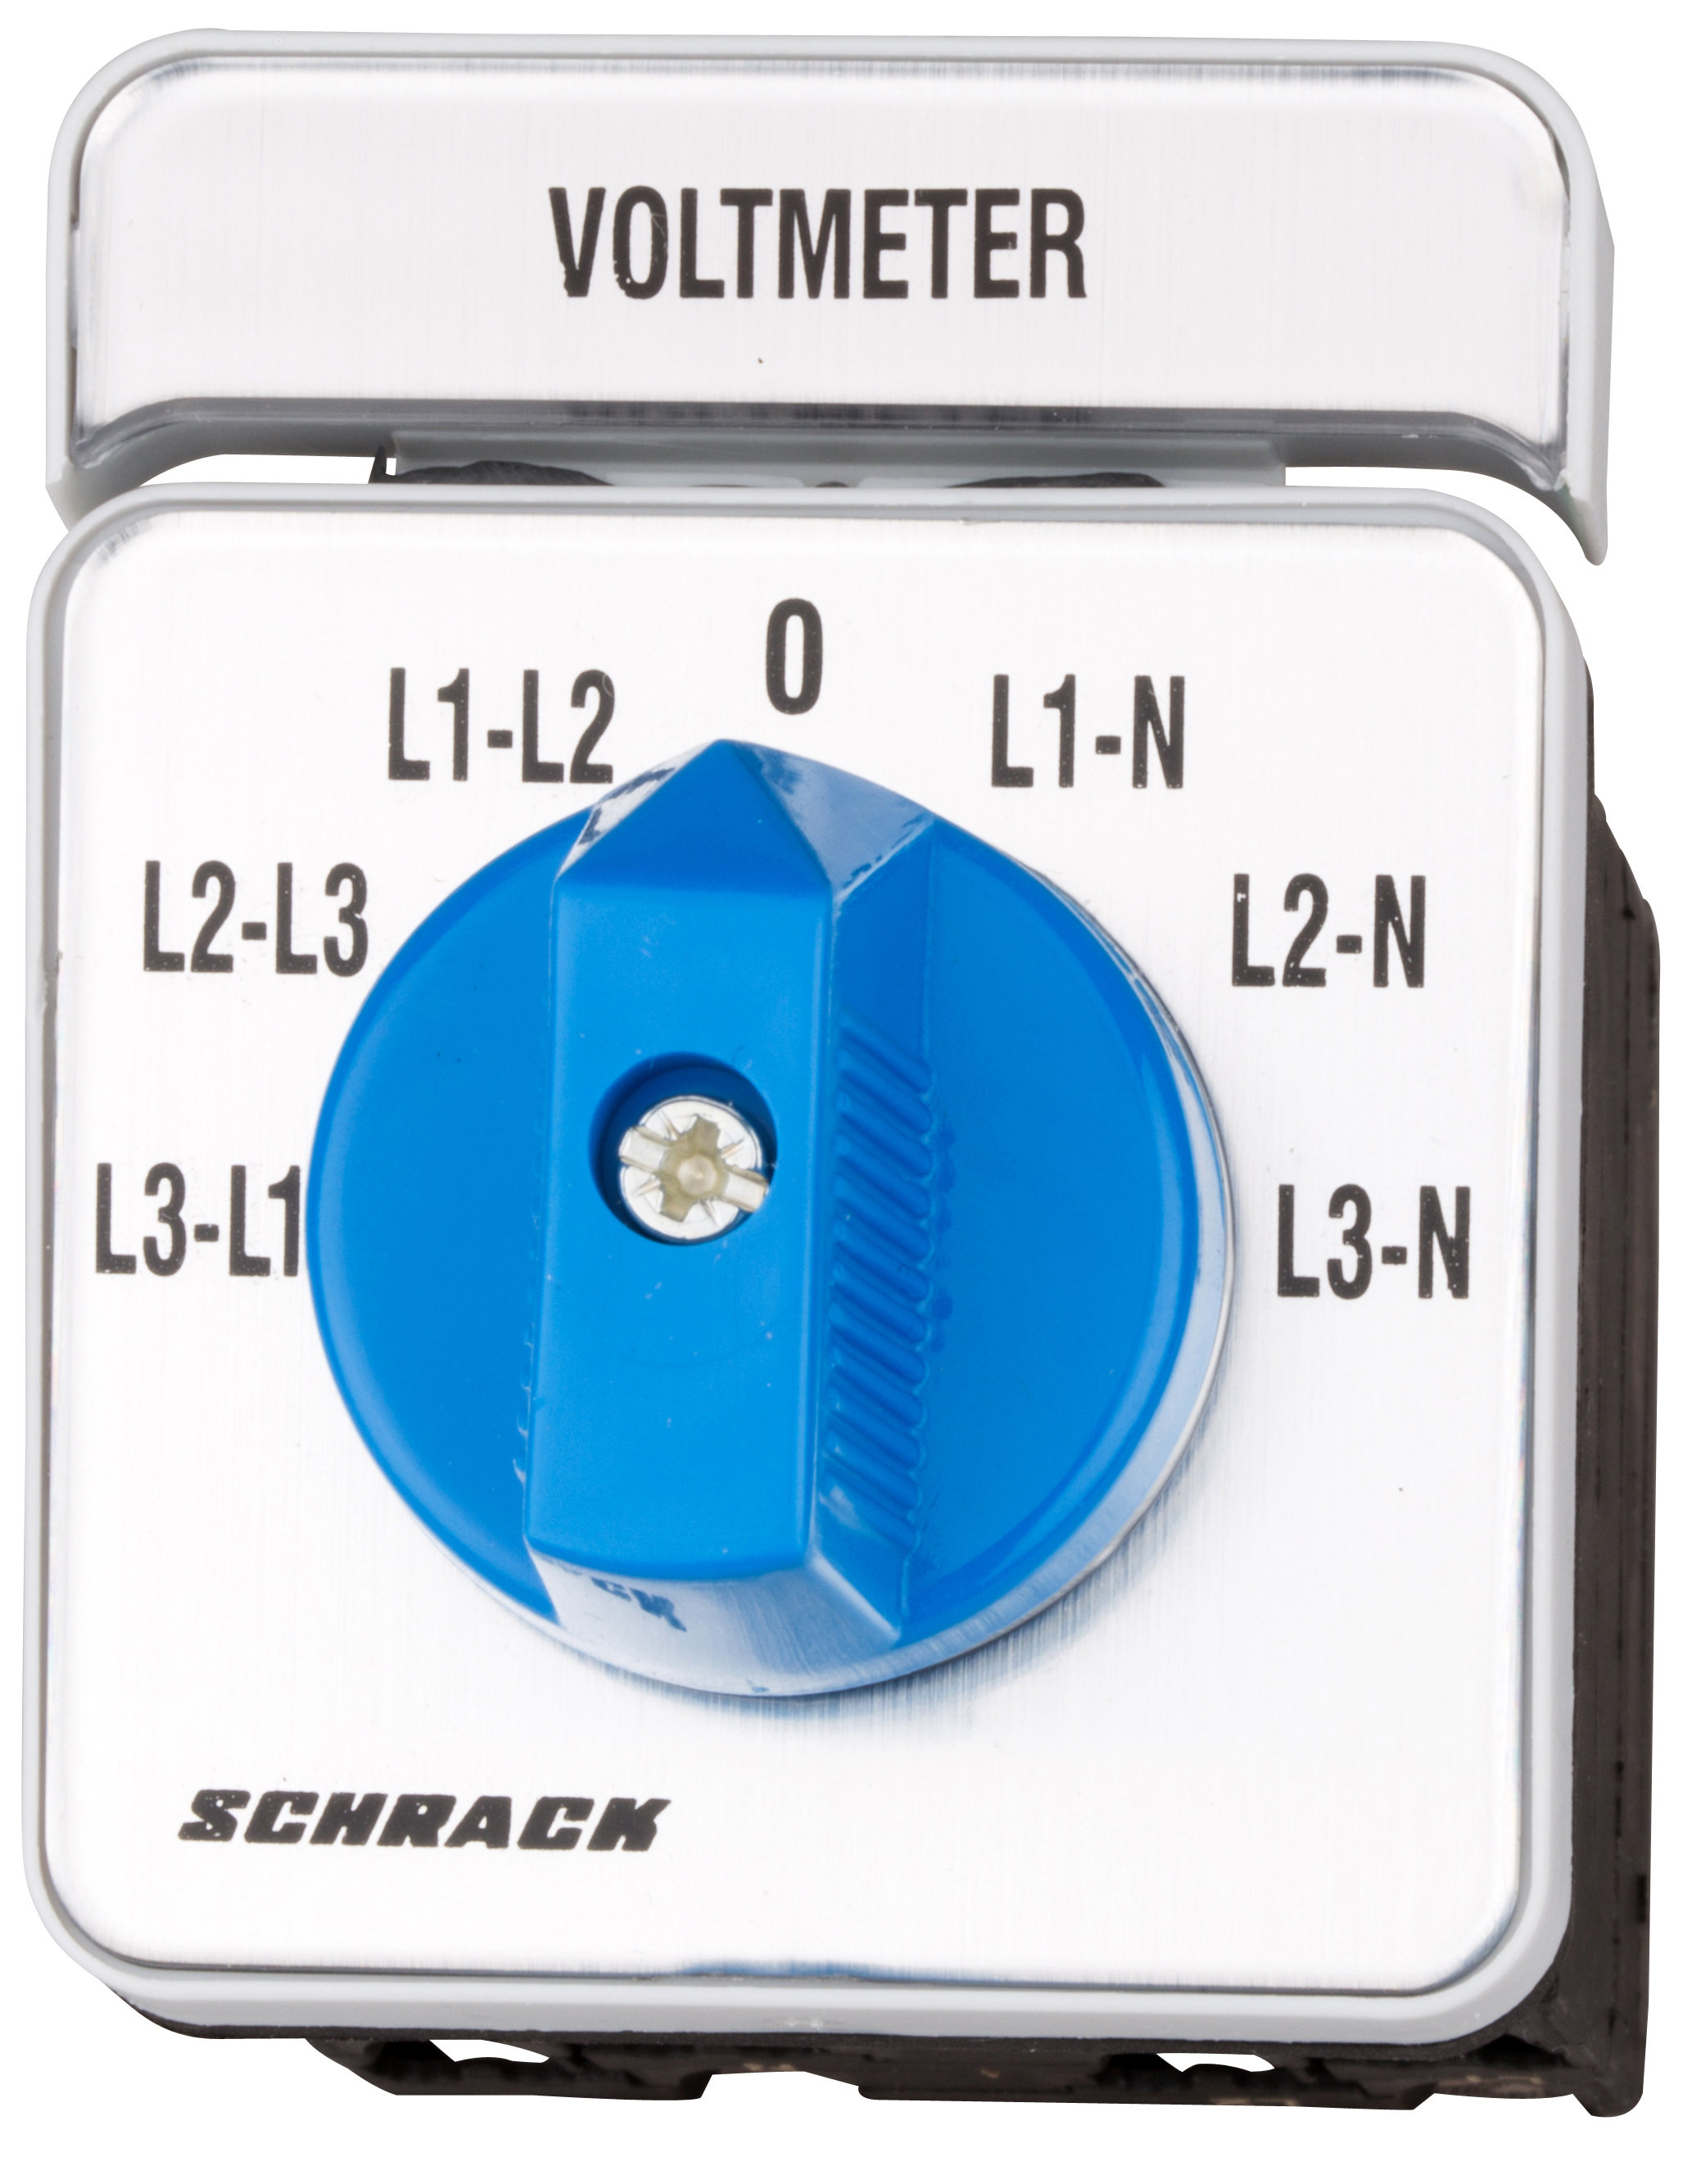 1 Stk Voltmeter-Umschalter 3 x L-L / 3 x L-N, Verteilereinbau IN009V00--